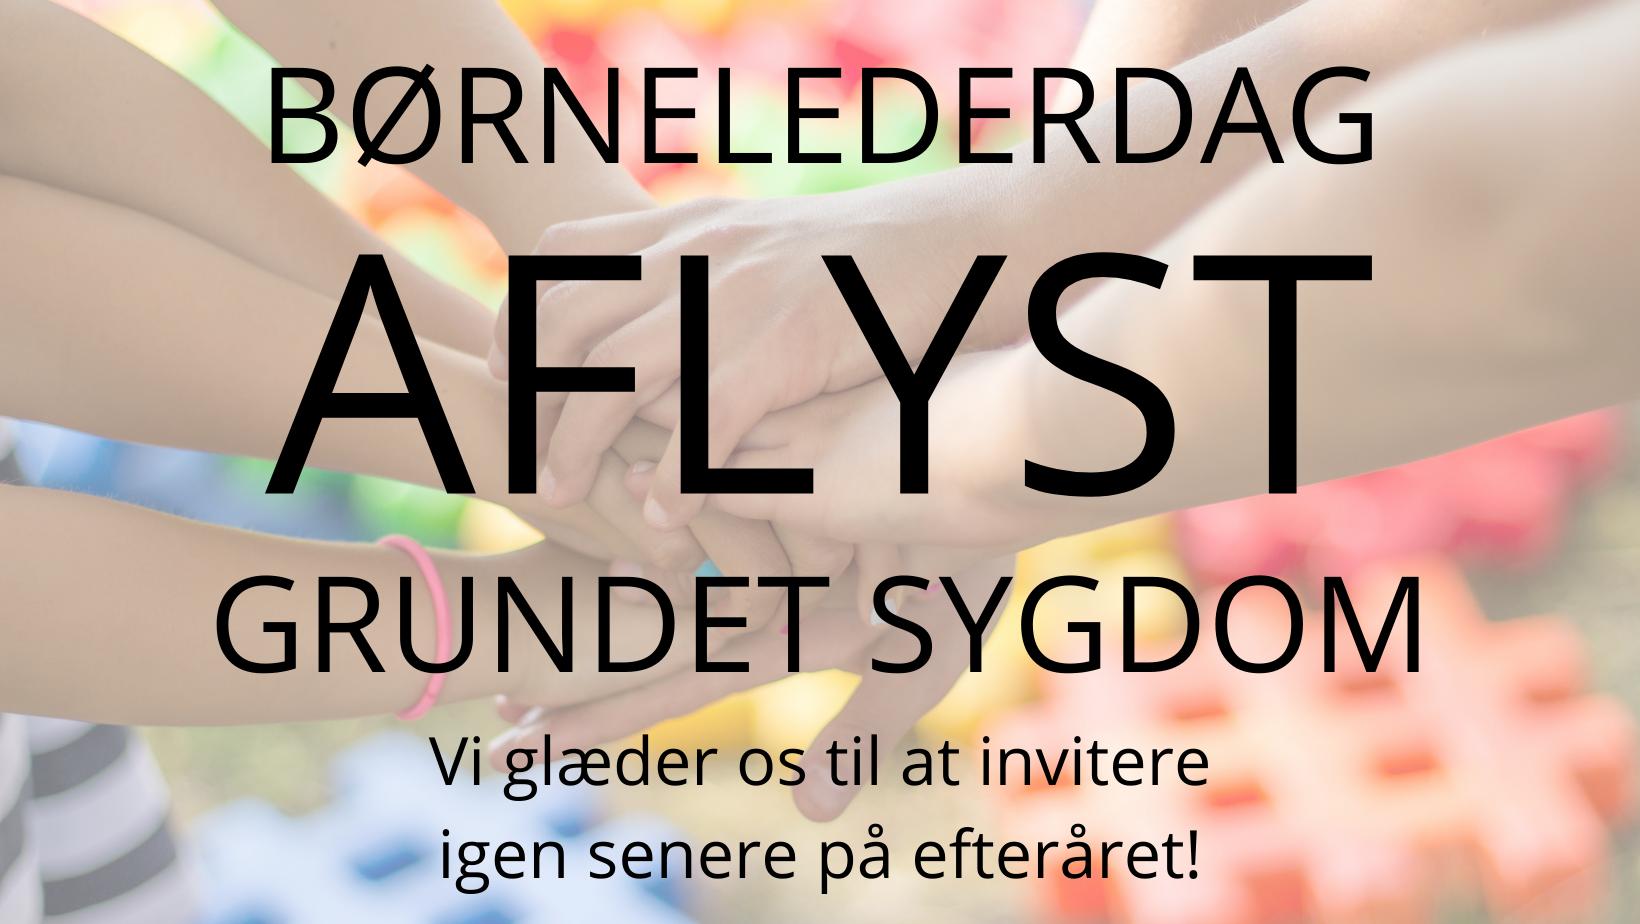 Børnelederdag - AFLYST